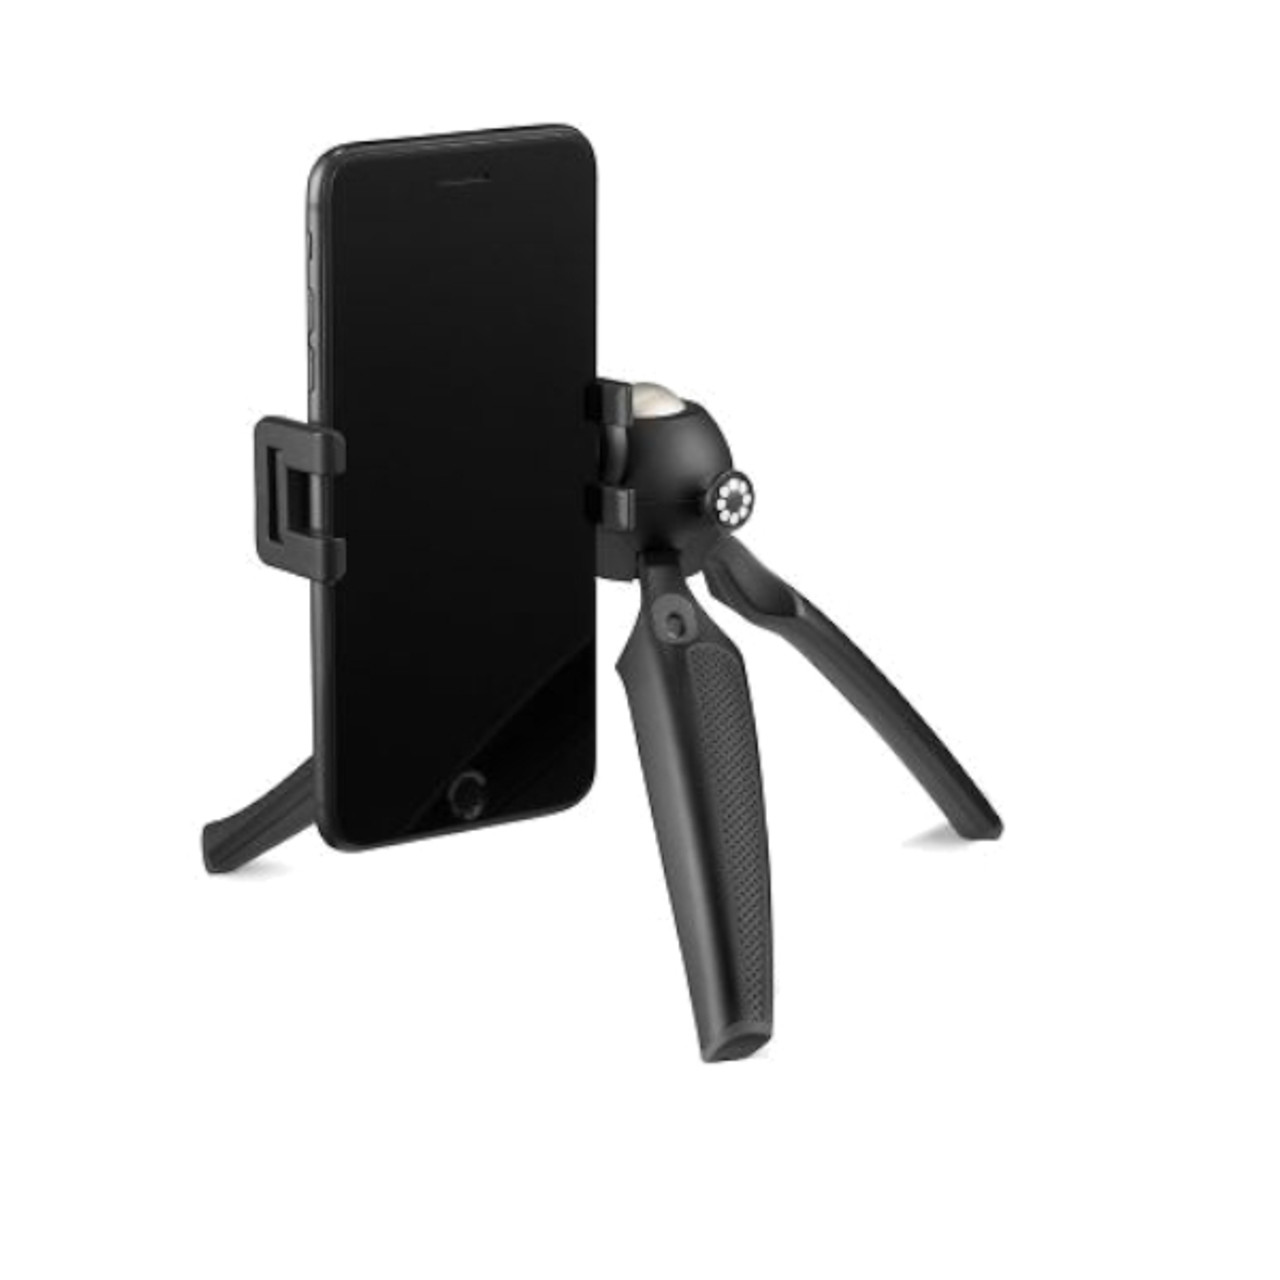 Joby Handypod Mobile